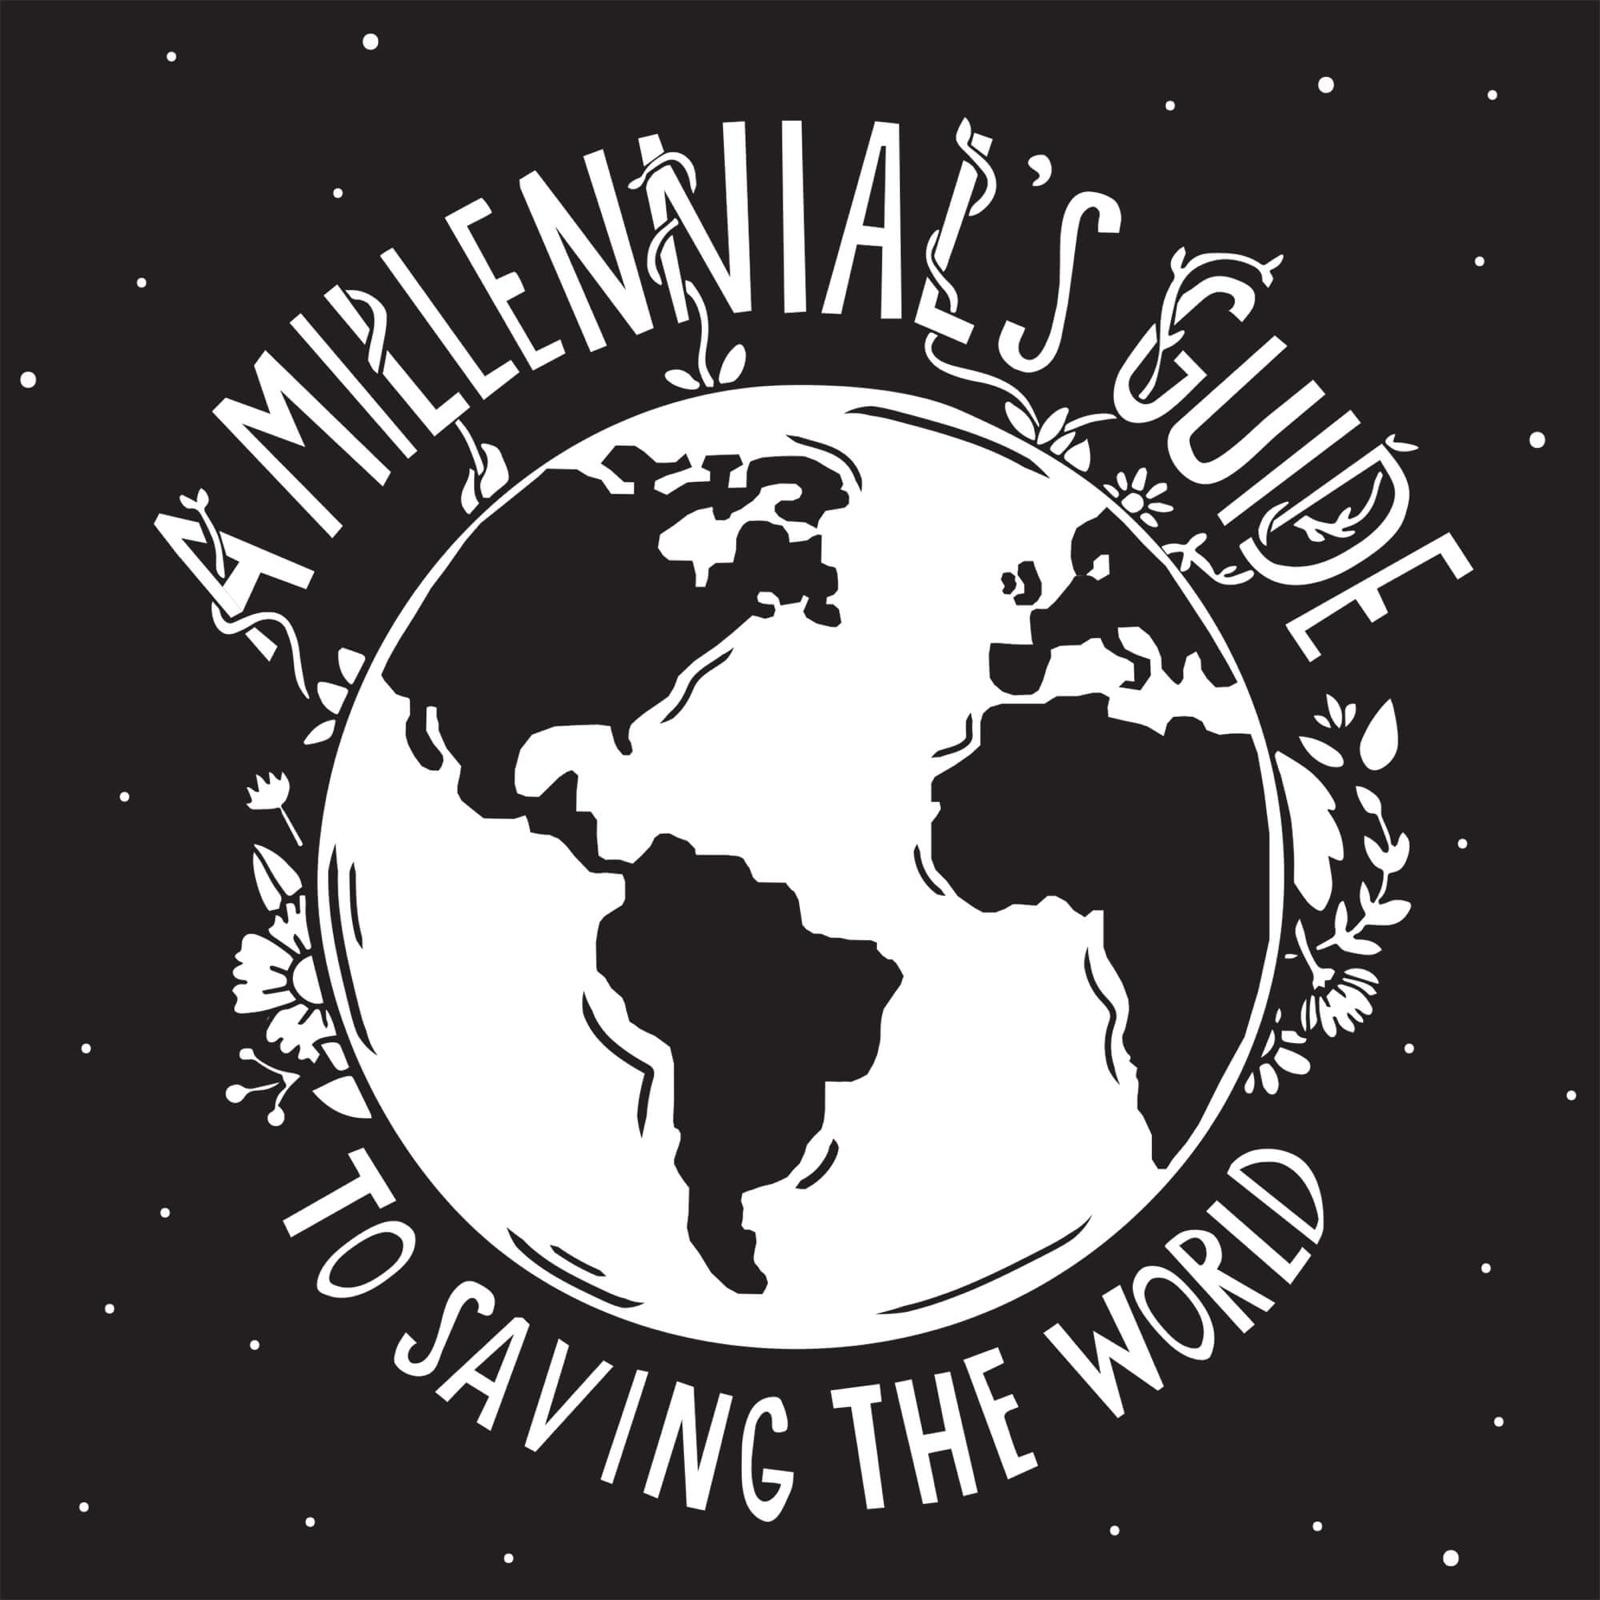 A Millennial's Guide to Saving the World show art